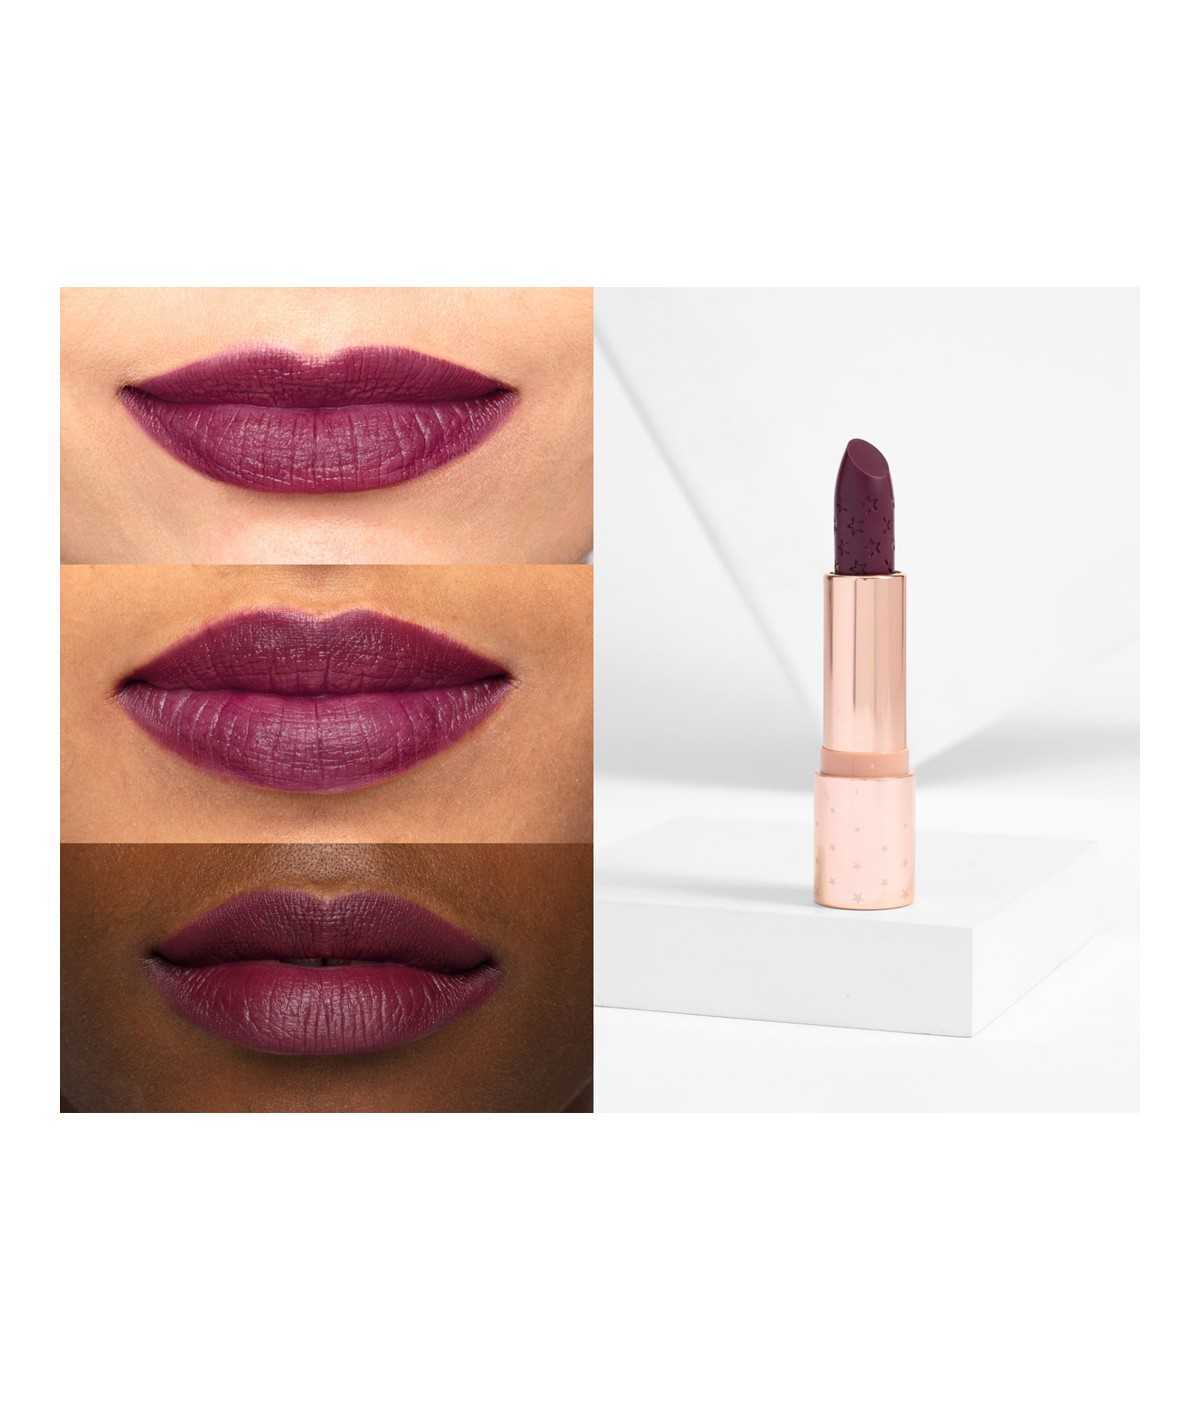 Colourpop lipstick - Alchemist